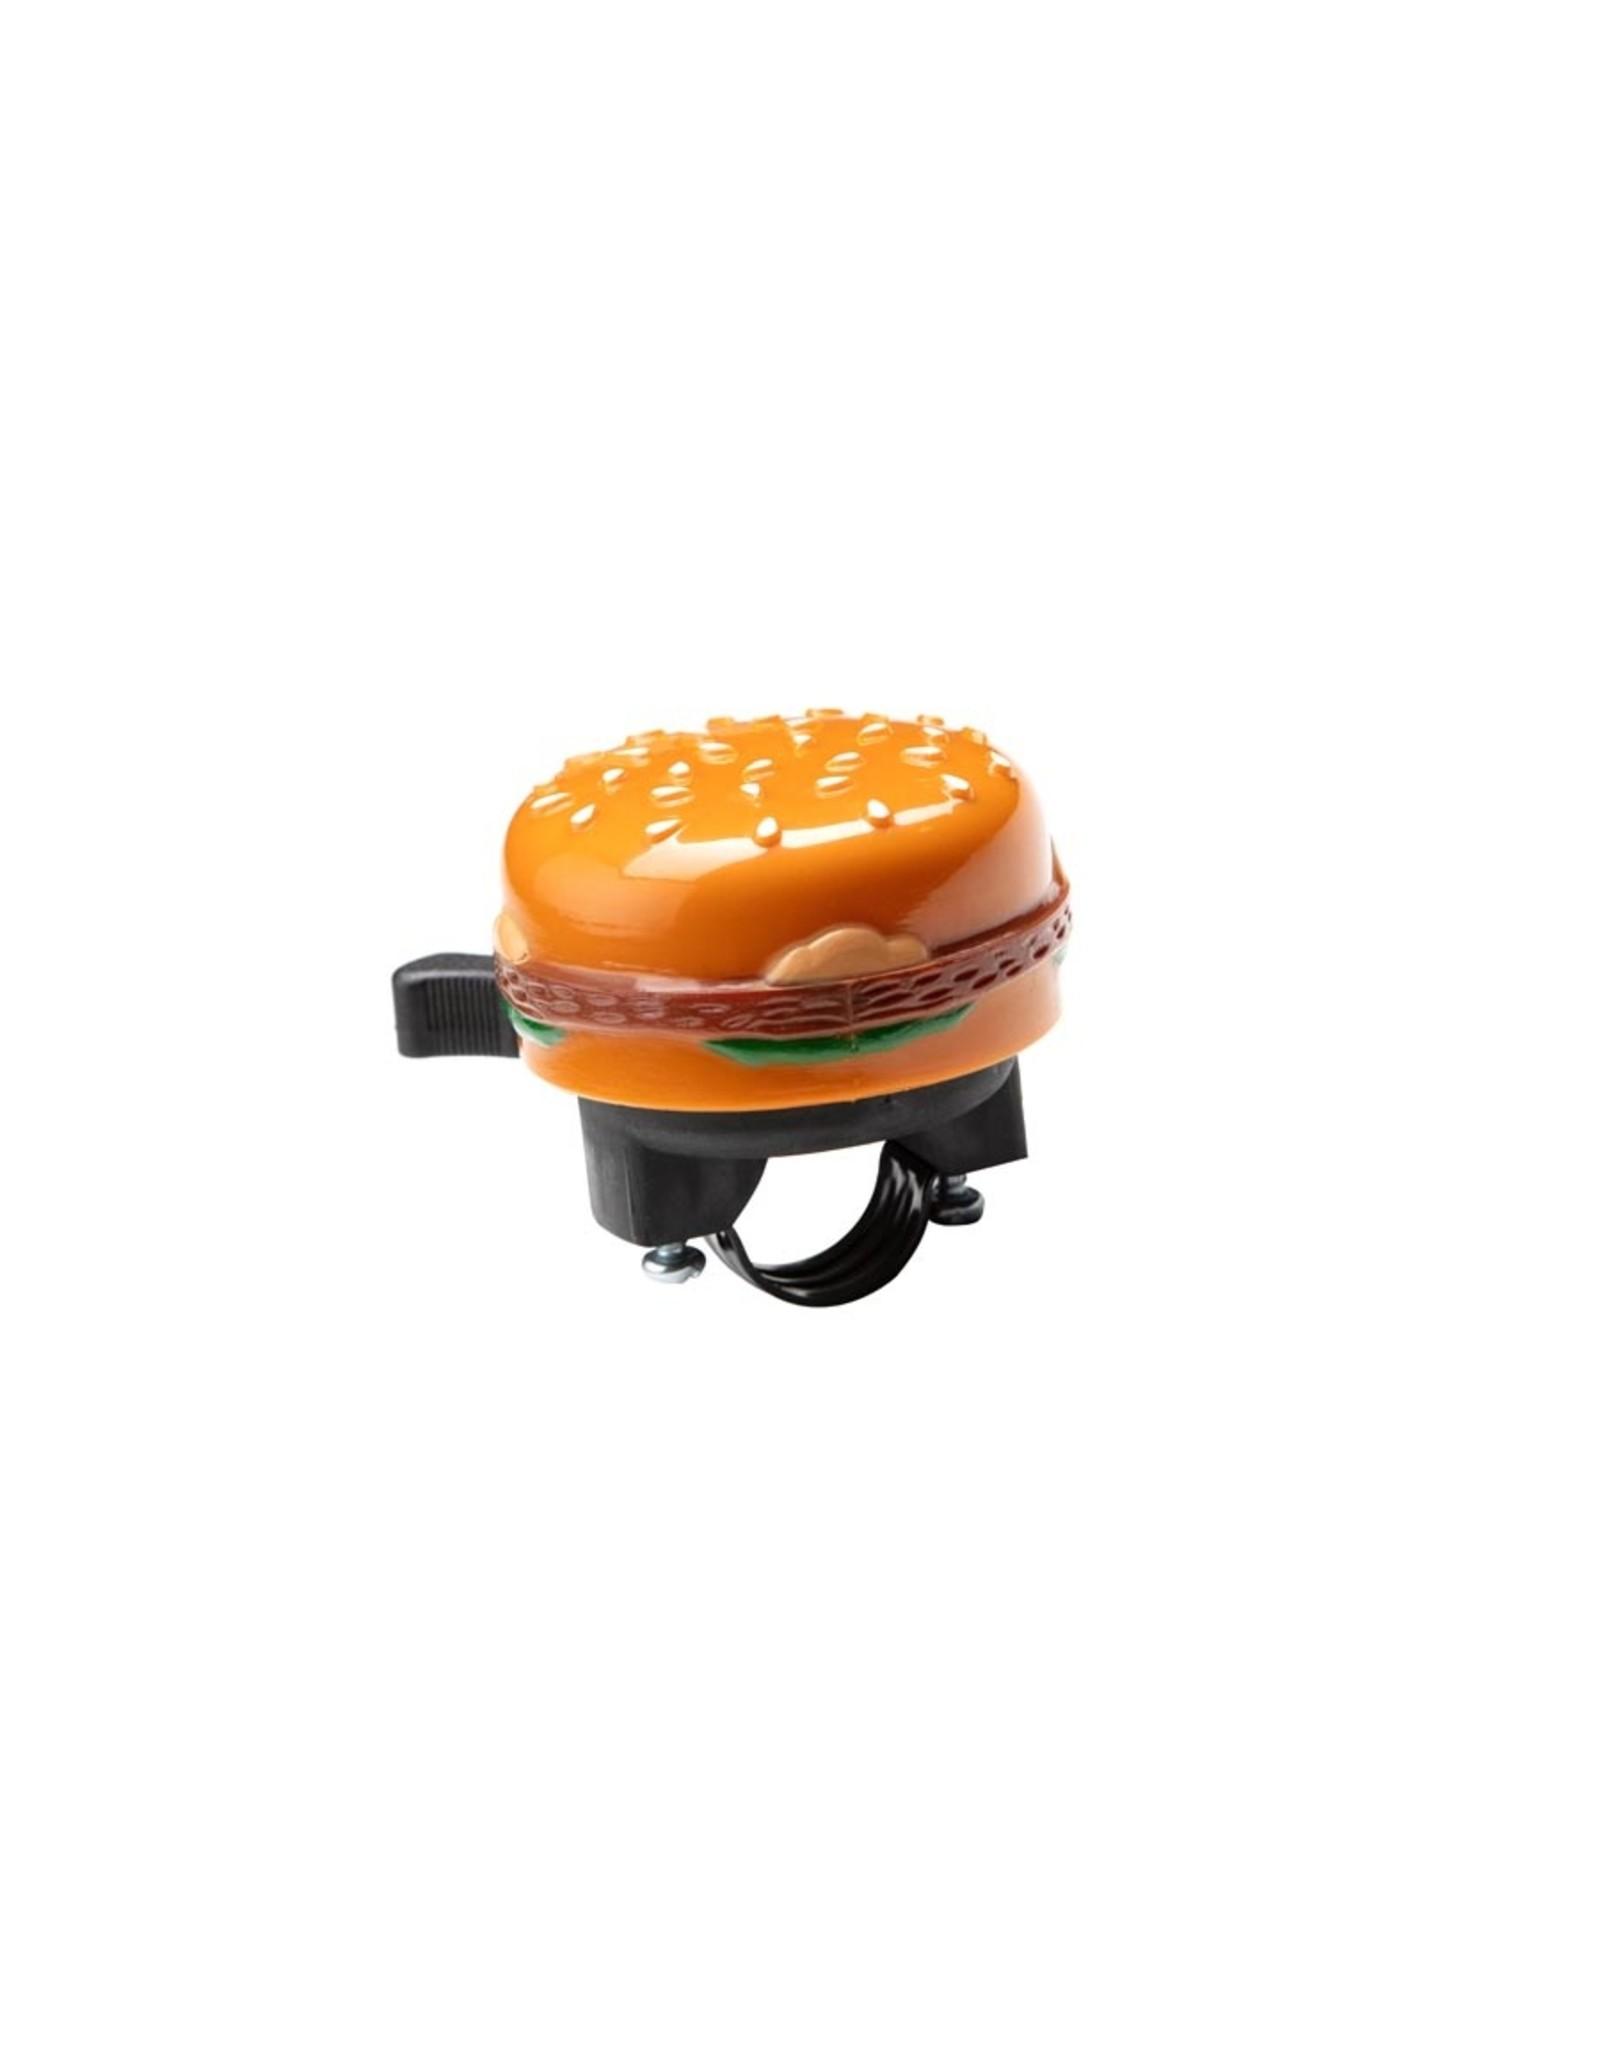 EVO Ring-A-Ling Burger